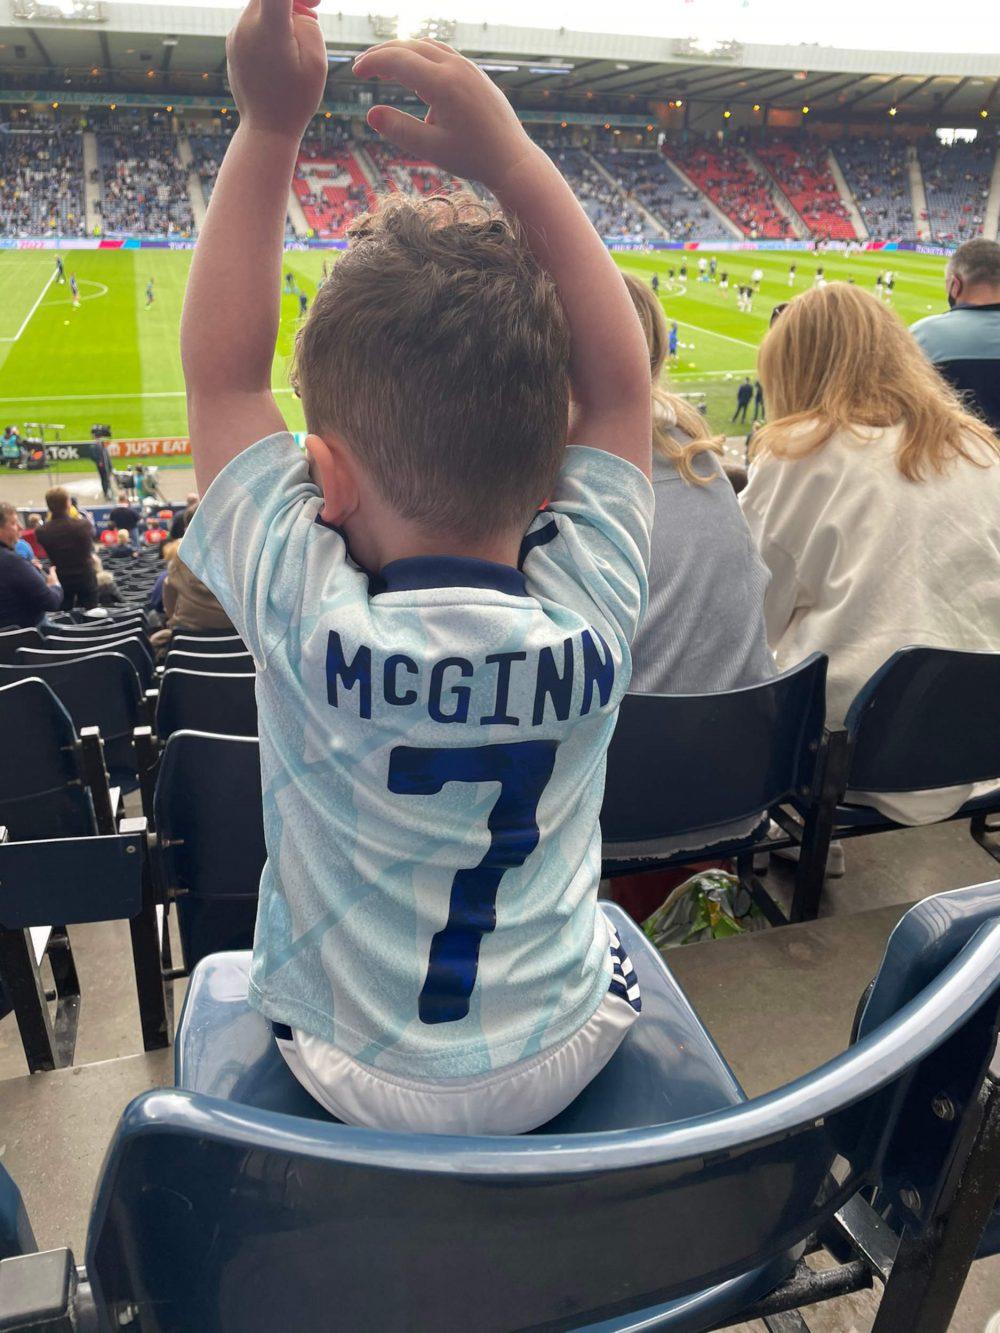 Young Scotland fan in McGinn shirt | Scottish Football News